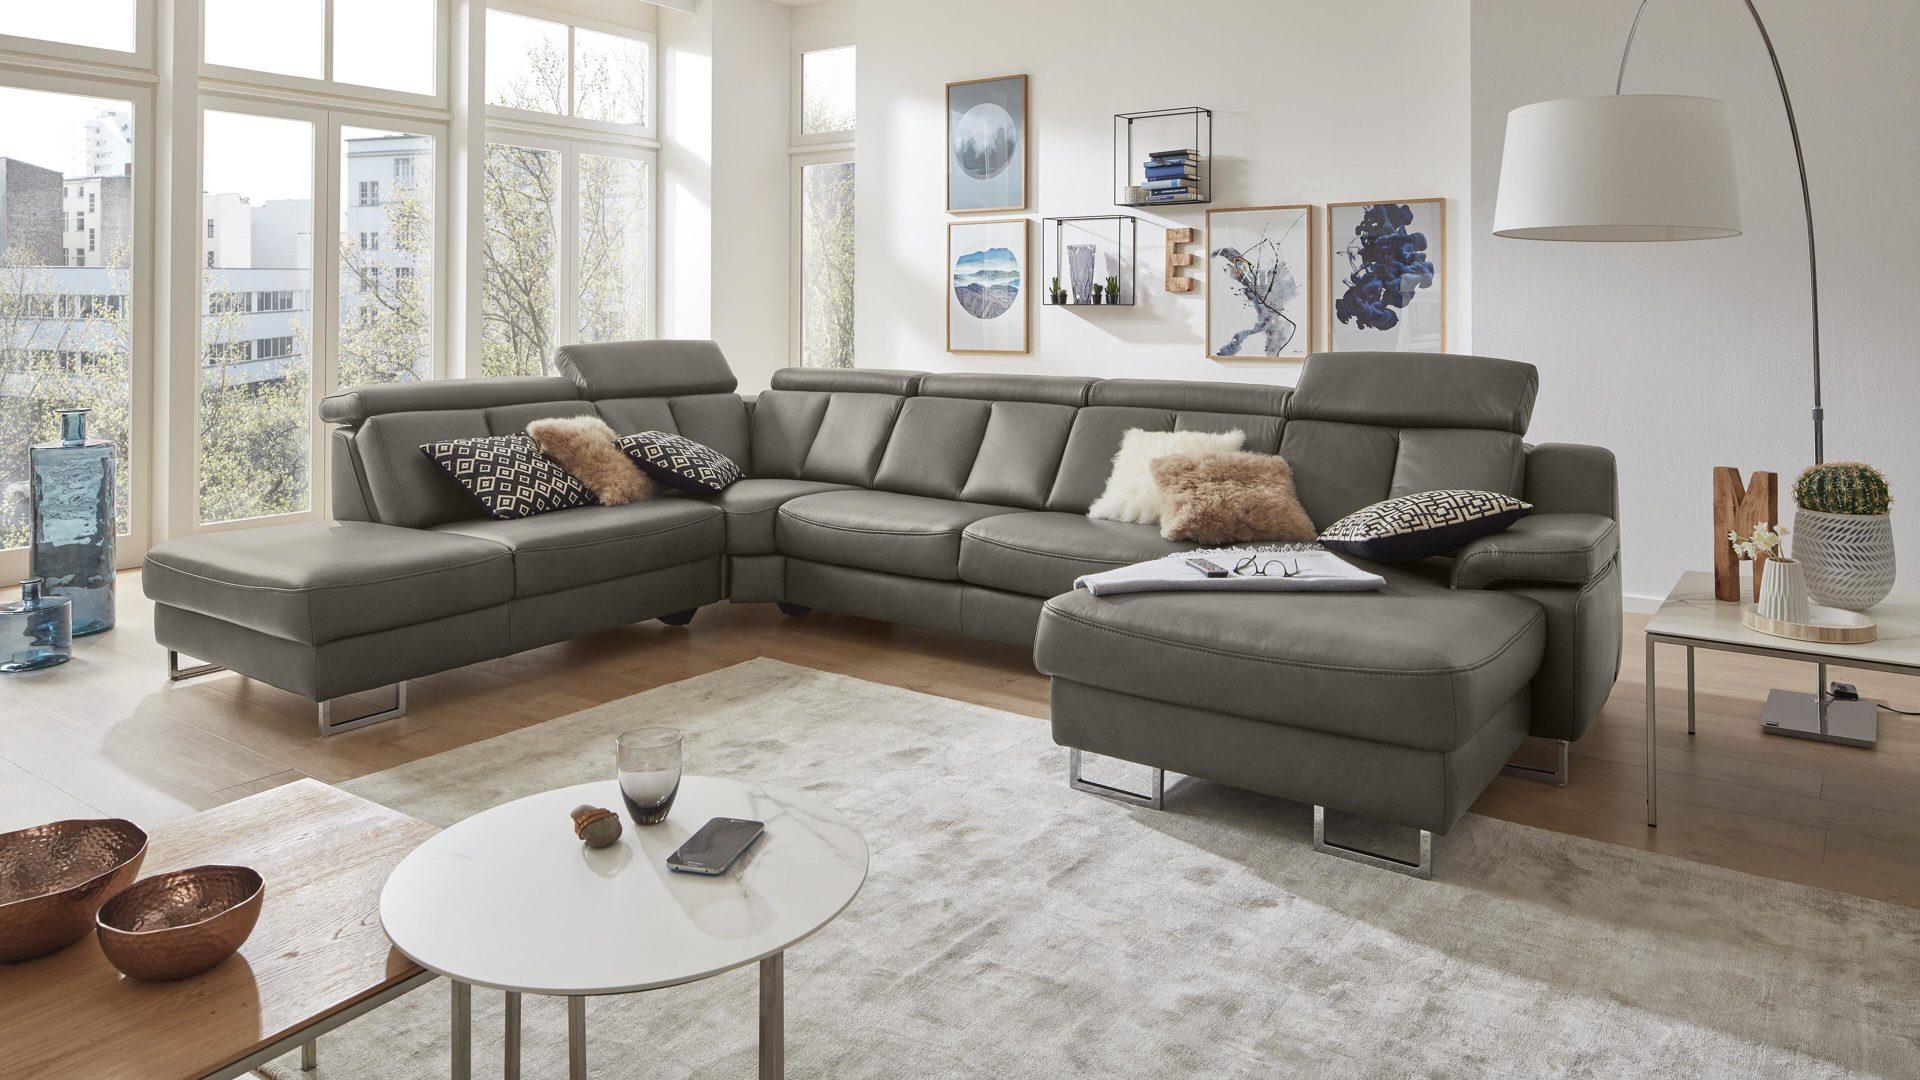 Interliving Sofa Serie 4050 Wohnlandschaft Rauchgraues Longlife